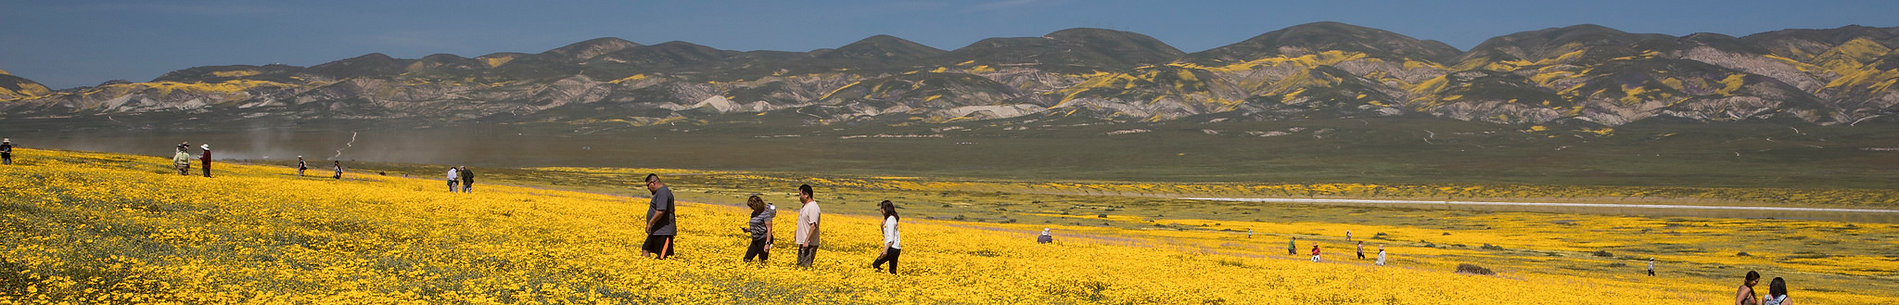 Super Bloom, Southern California